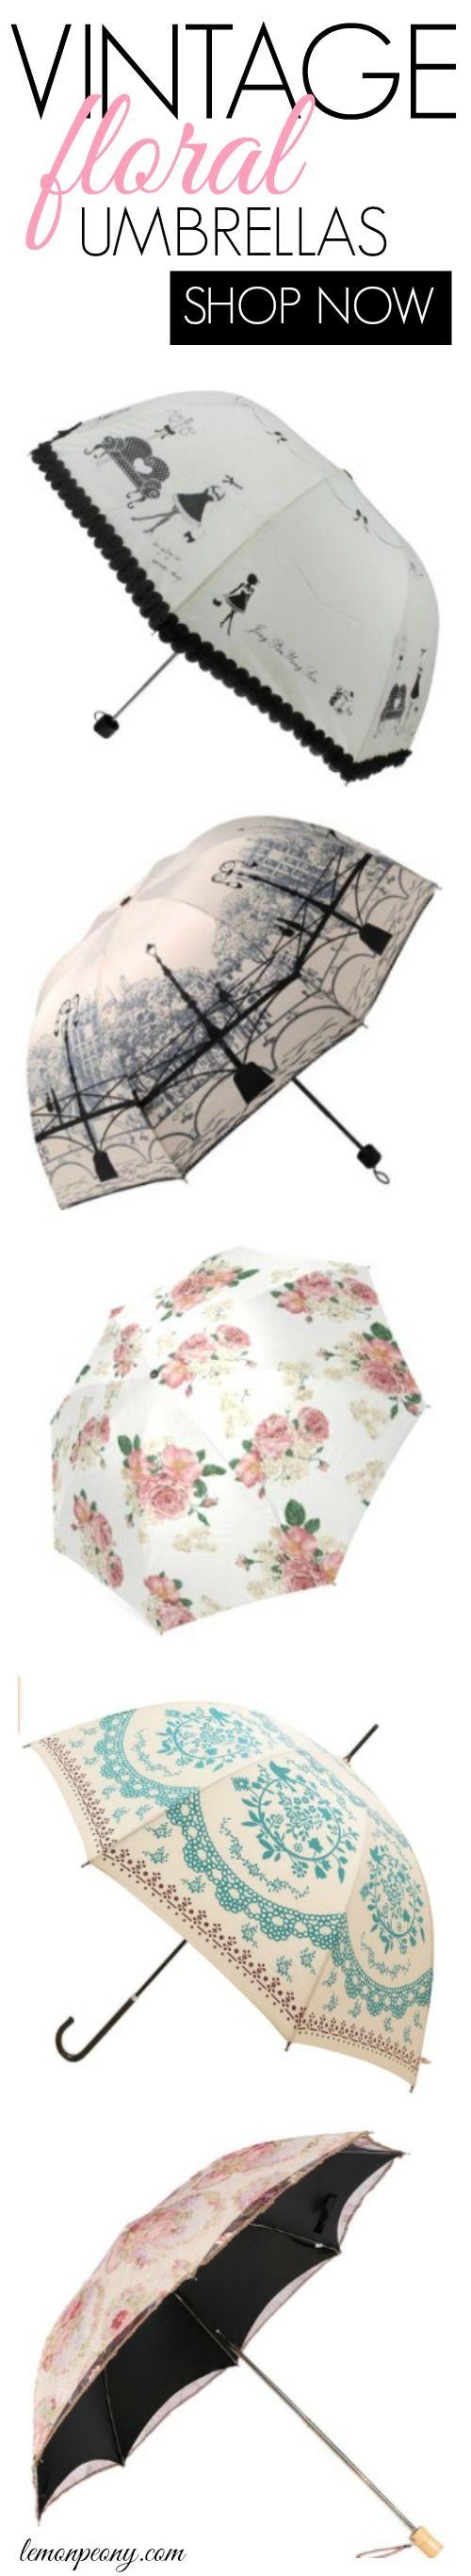 Vintage Floral Umbrellas! Cute and fun umbrellas for rainy days!